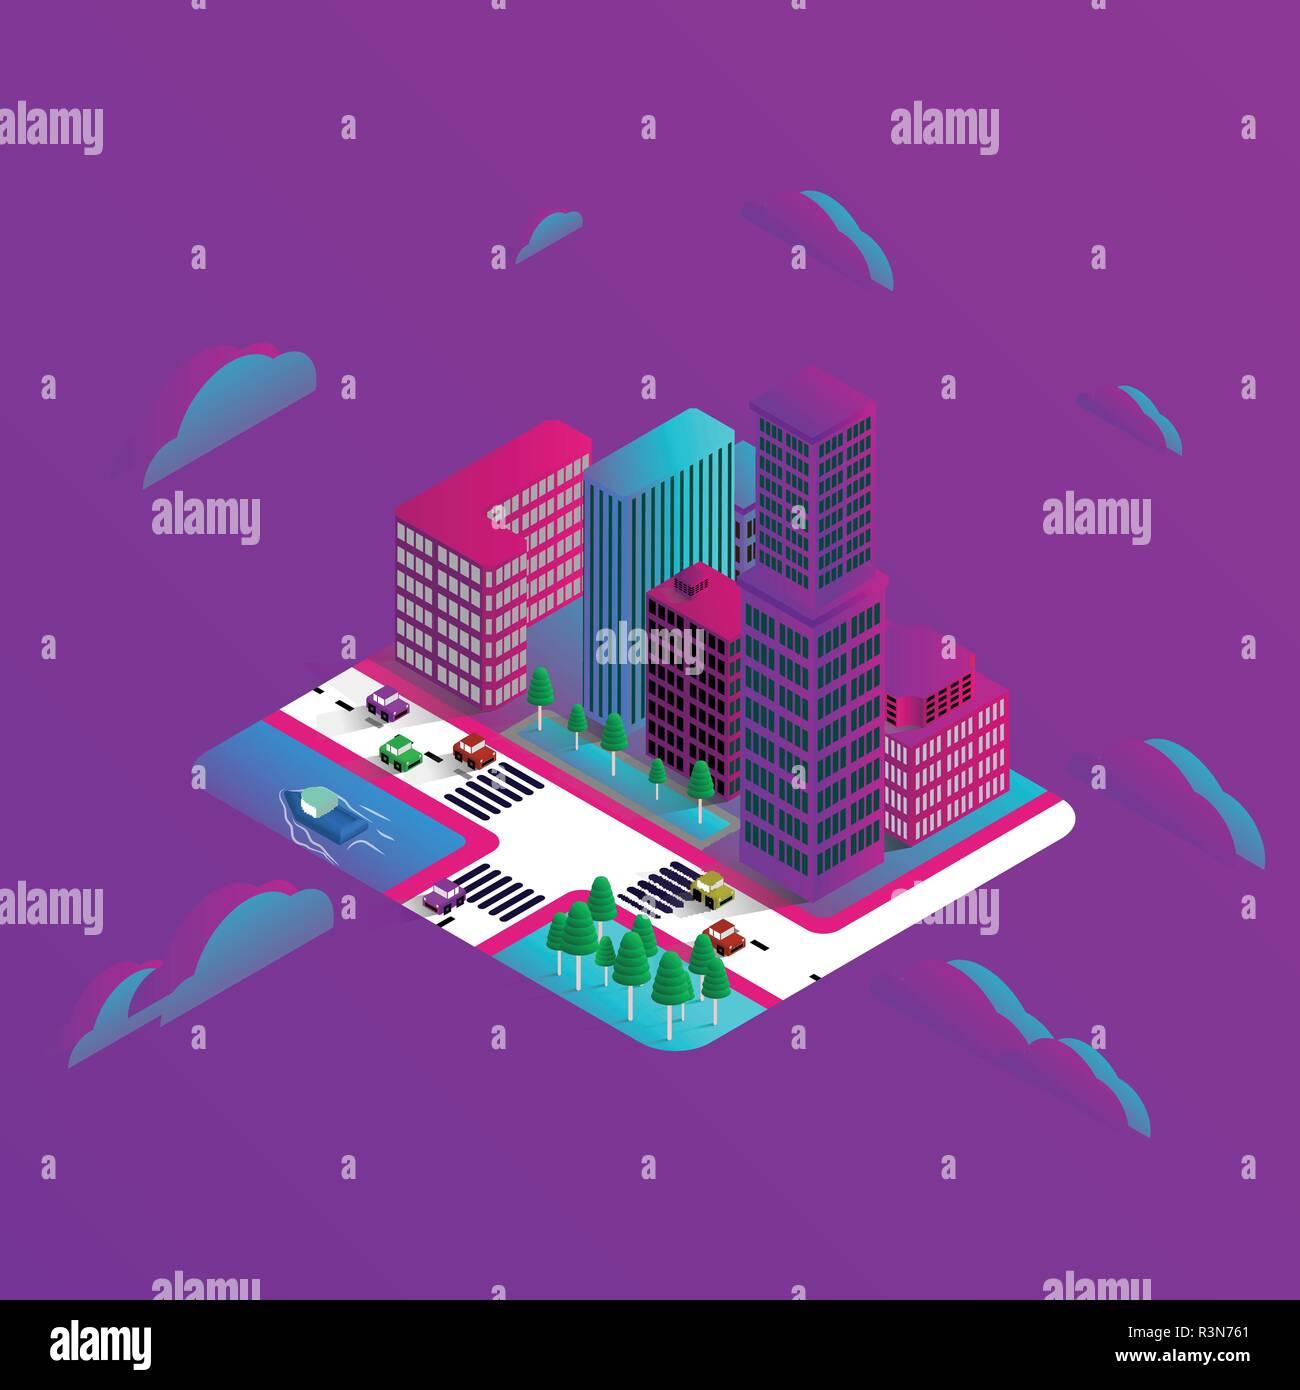 Floating house future im genes de stock floating house for Crea casa 3d